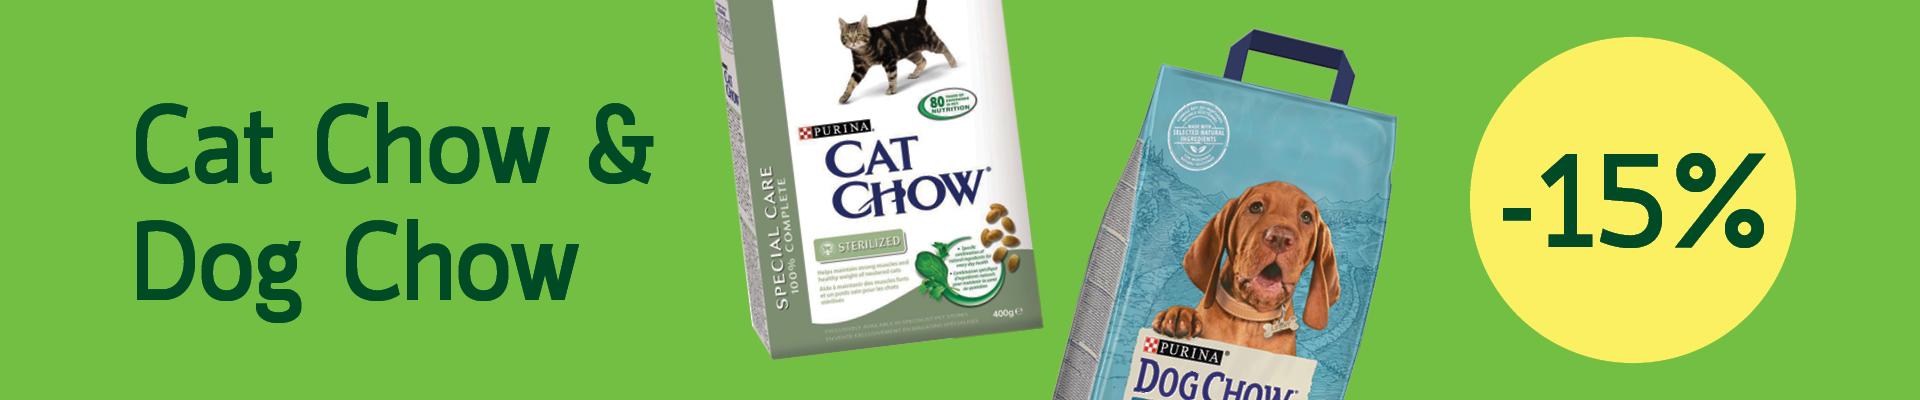 Cat Chow & Dog Chow -15%